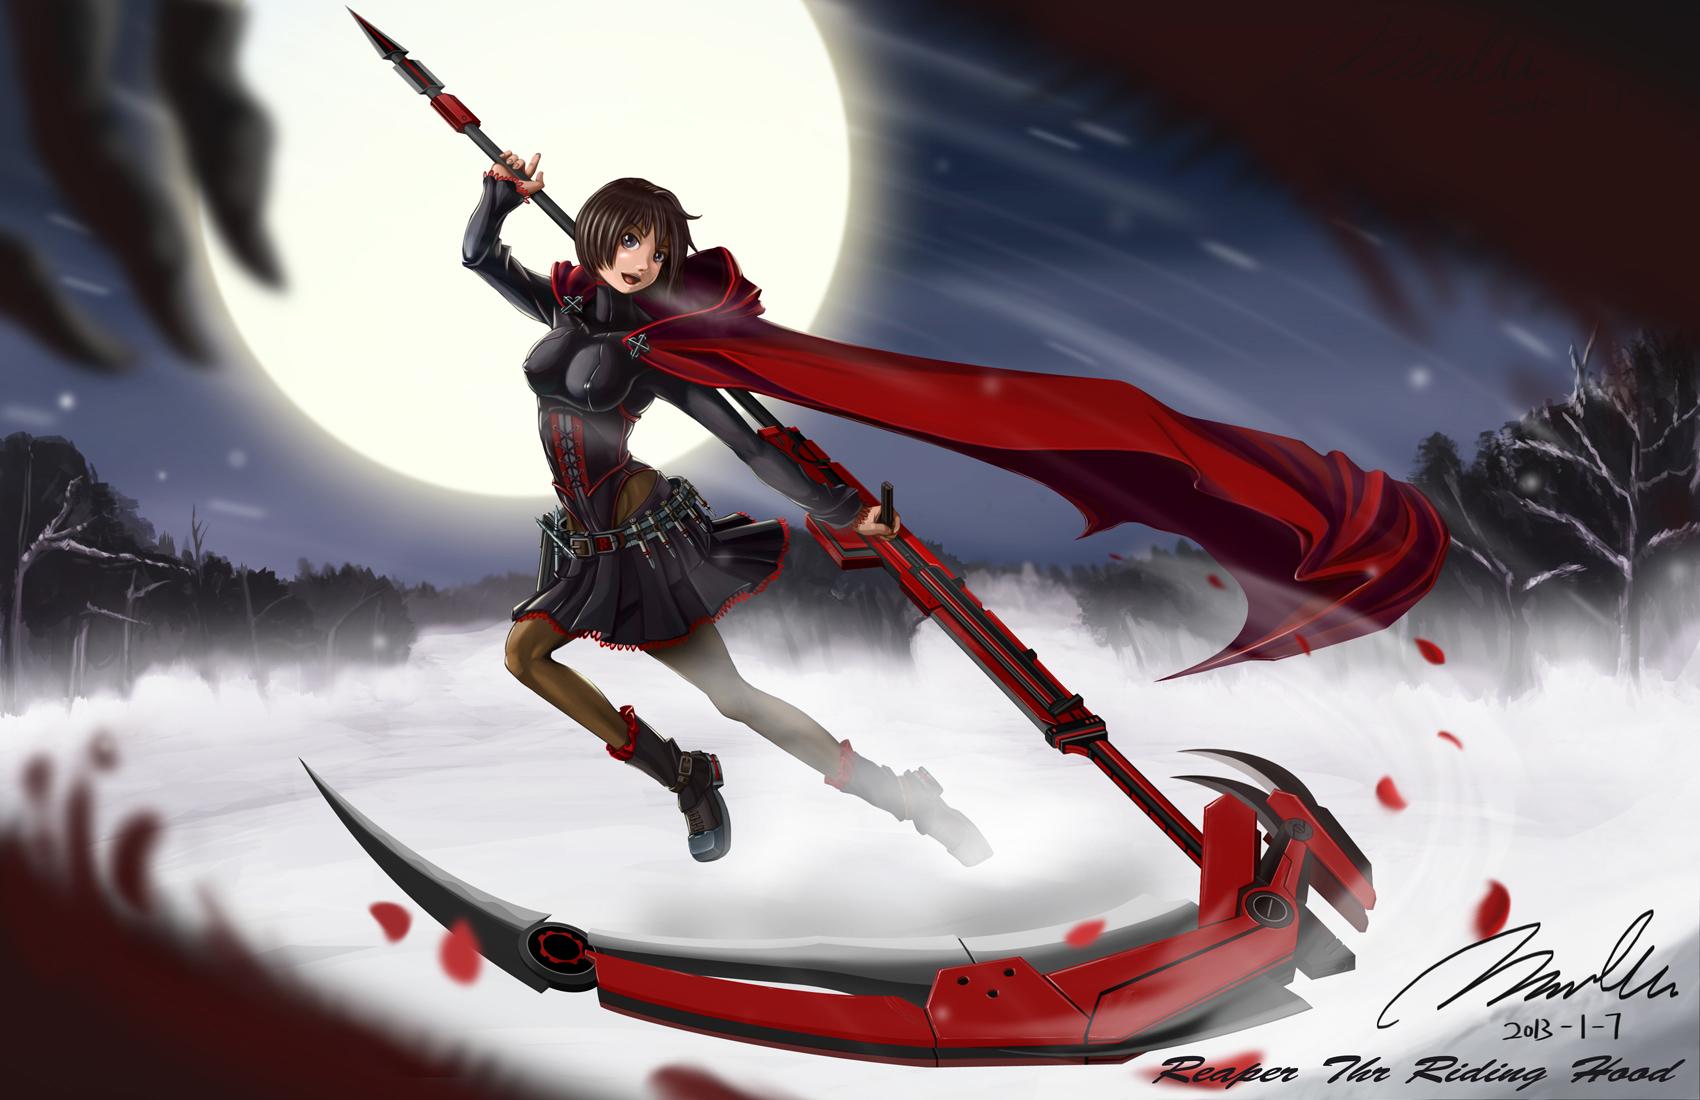 rwby anime scythe wallpaper - photo #4